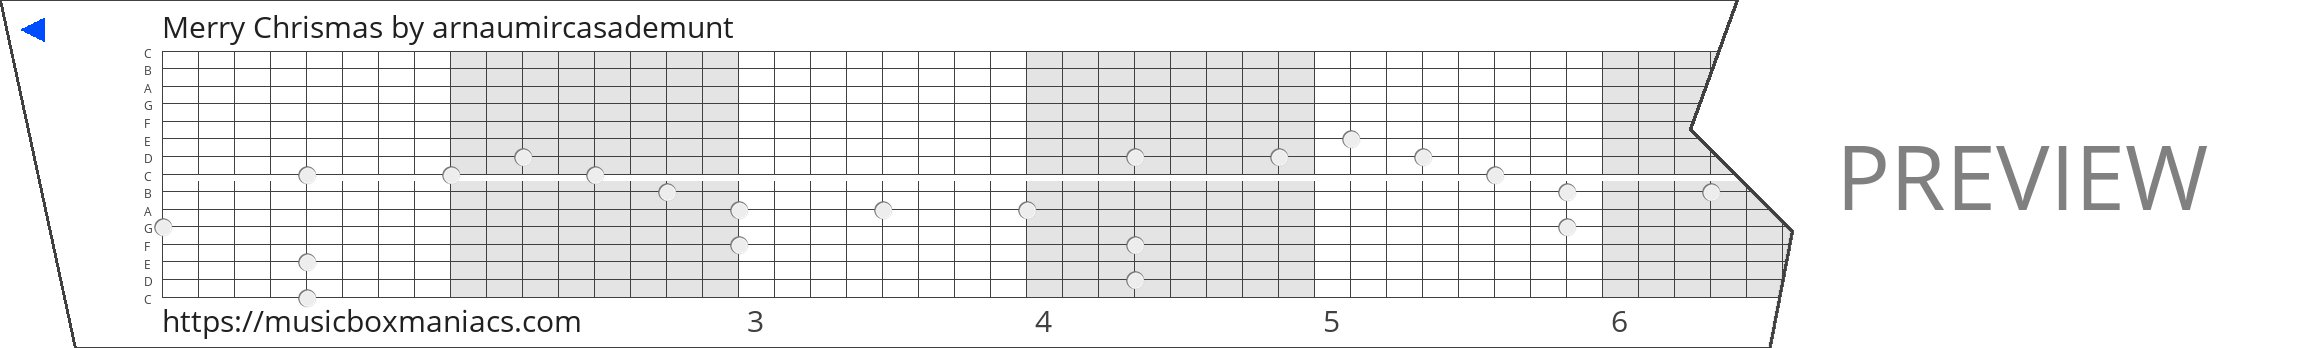 Merry Chrismas 15 note music box paper strip